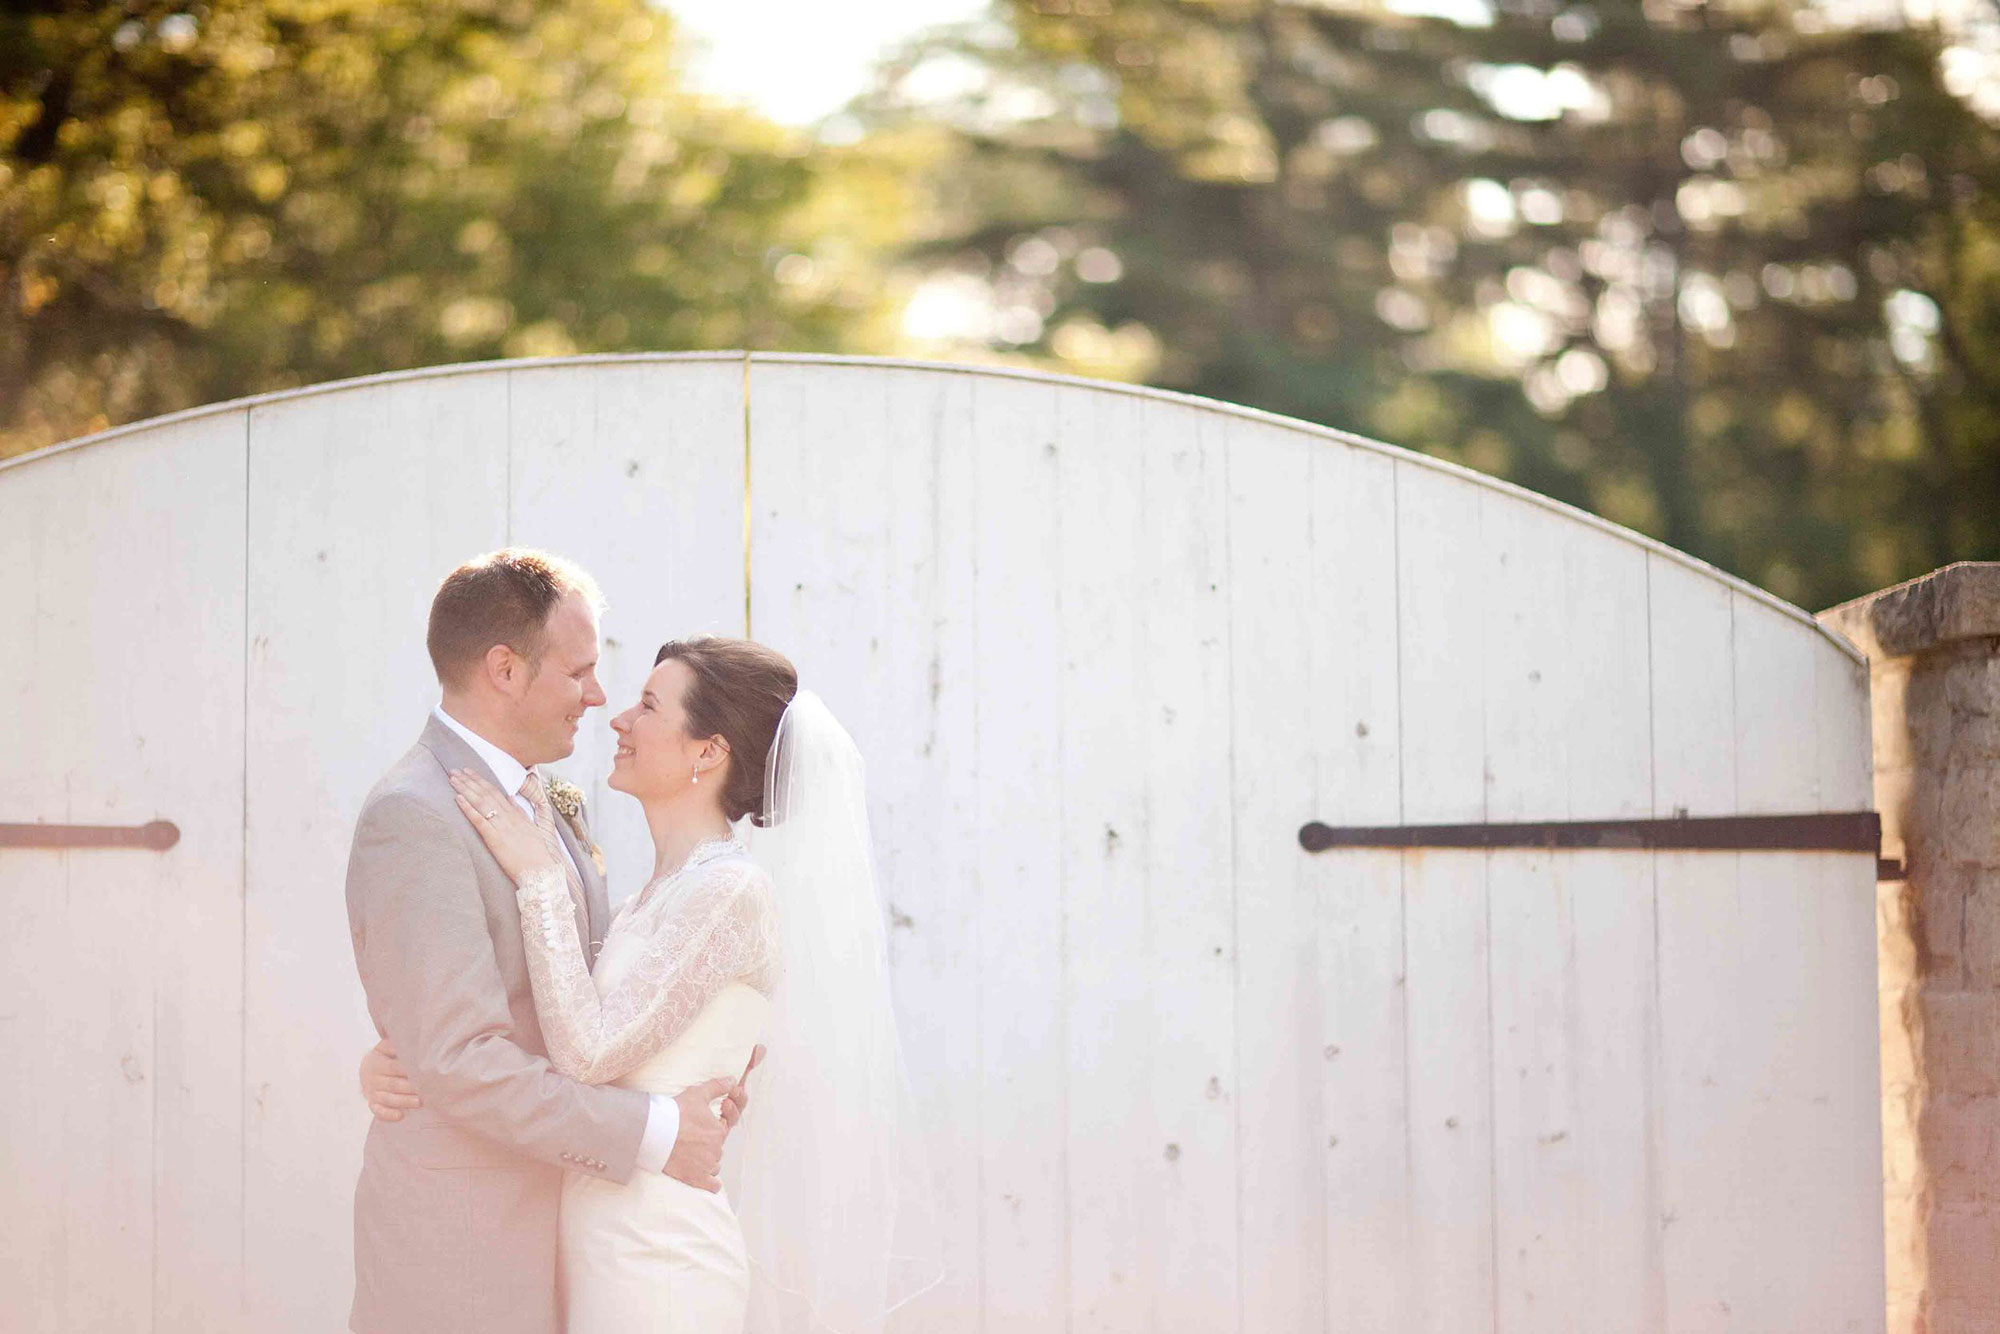 Amanda-Cowley-Willowbank-Vineyard-Bride-Photo-By-White-Photographie-030.jpg